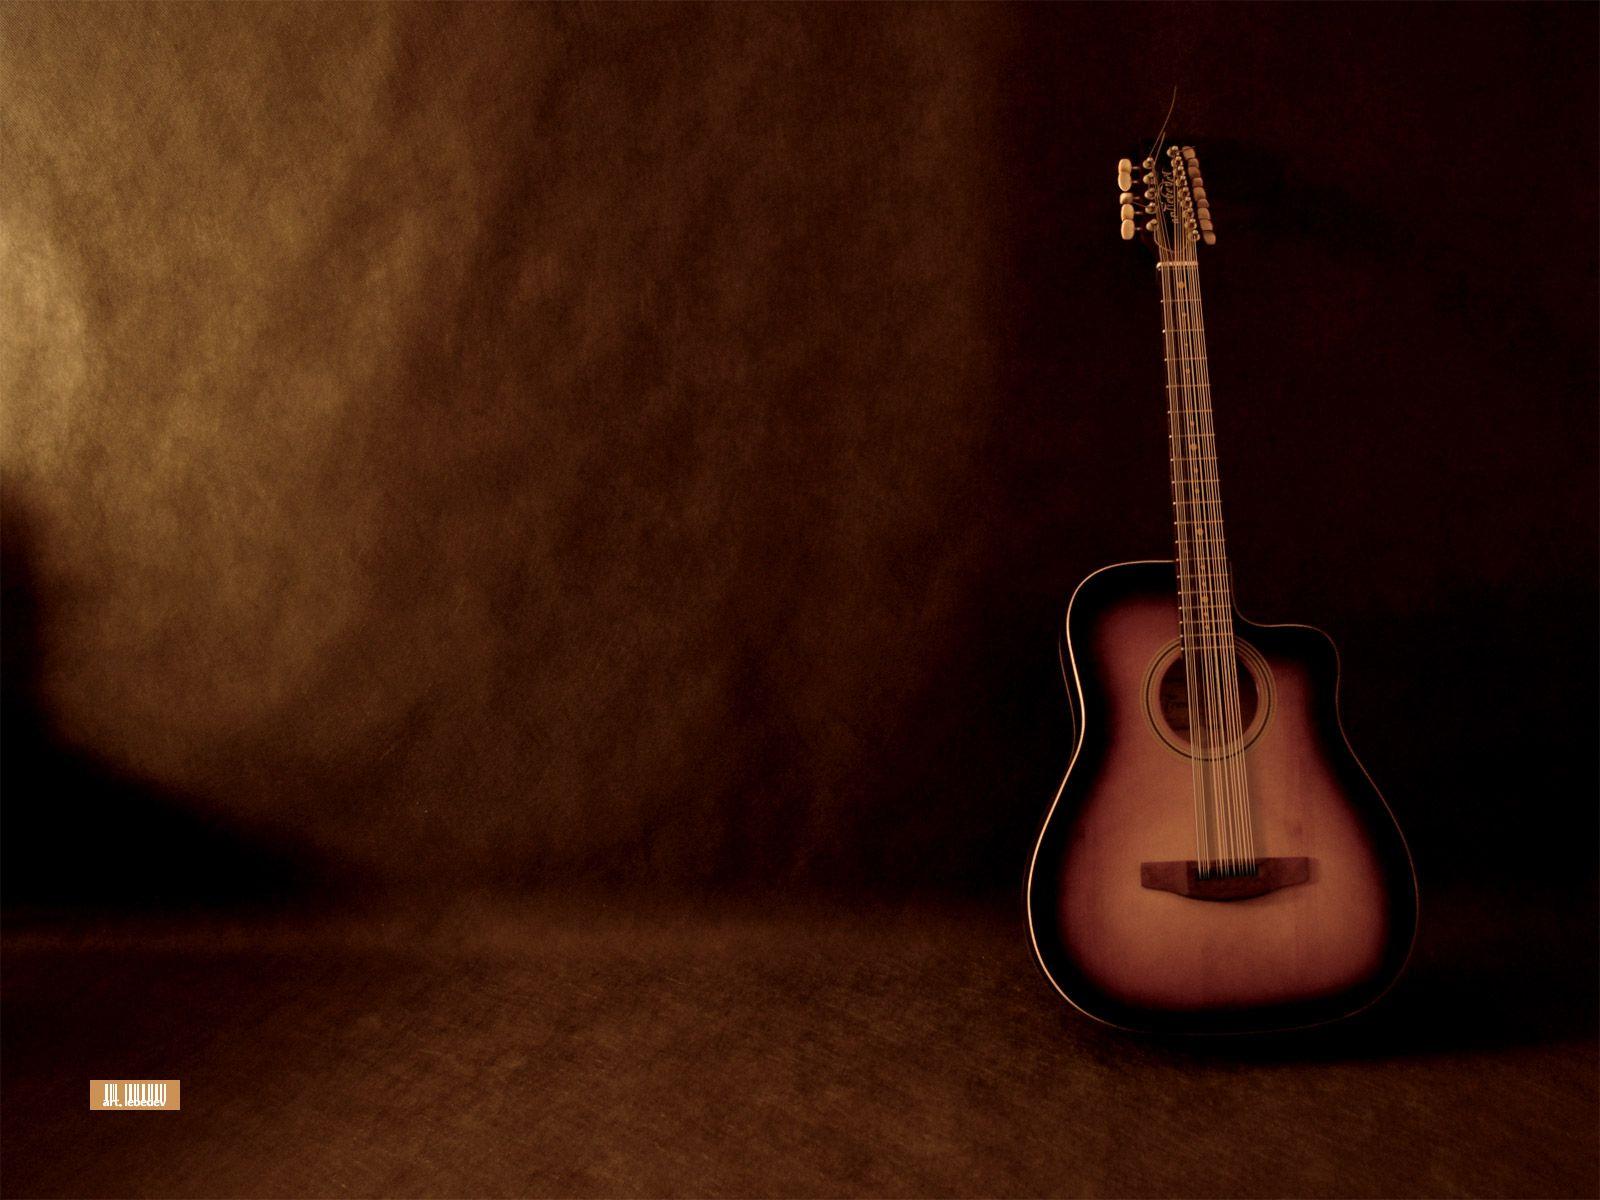 Google Image Result For Http Stuffkit Com Wp Content Uploads 2011 08 Guitar Hd Wallpaper 40 Jpg Music Guitar Guitar Acoustic Guitar Music